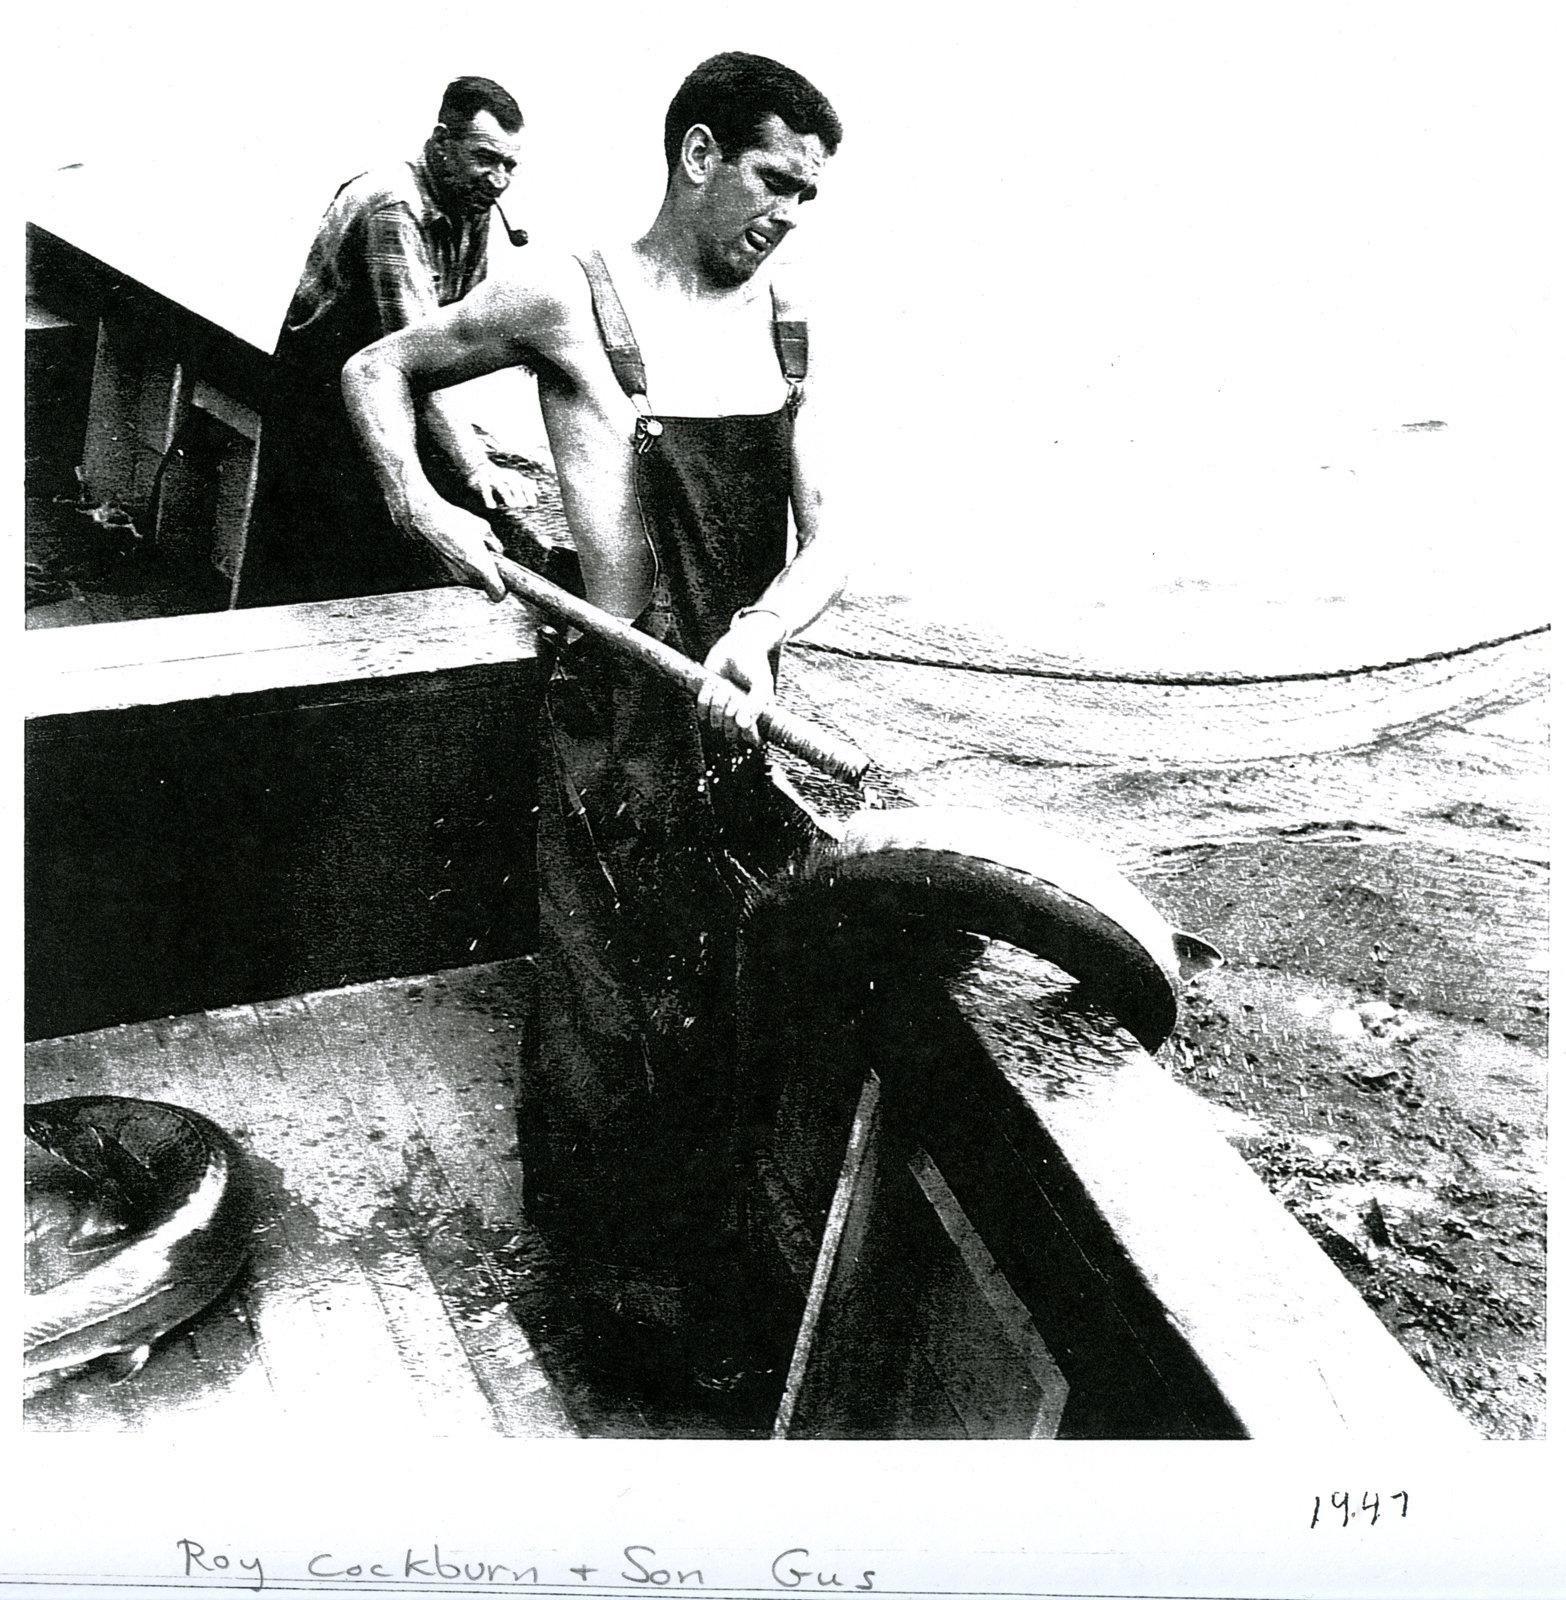 Roy & Gus Cockburn